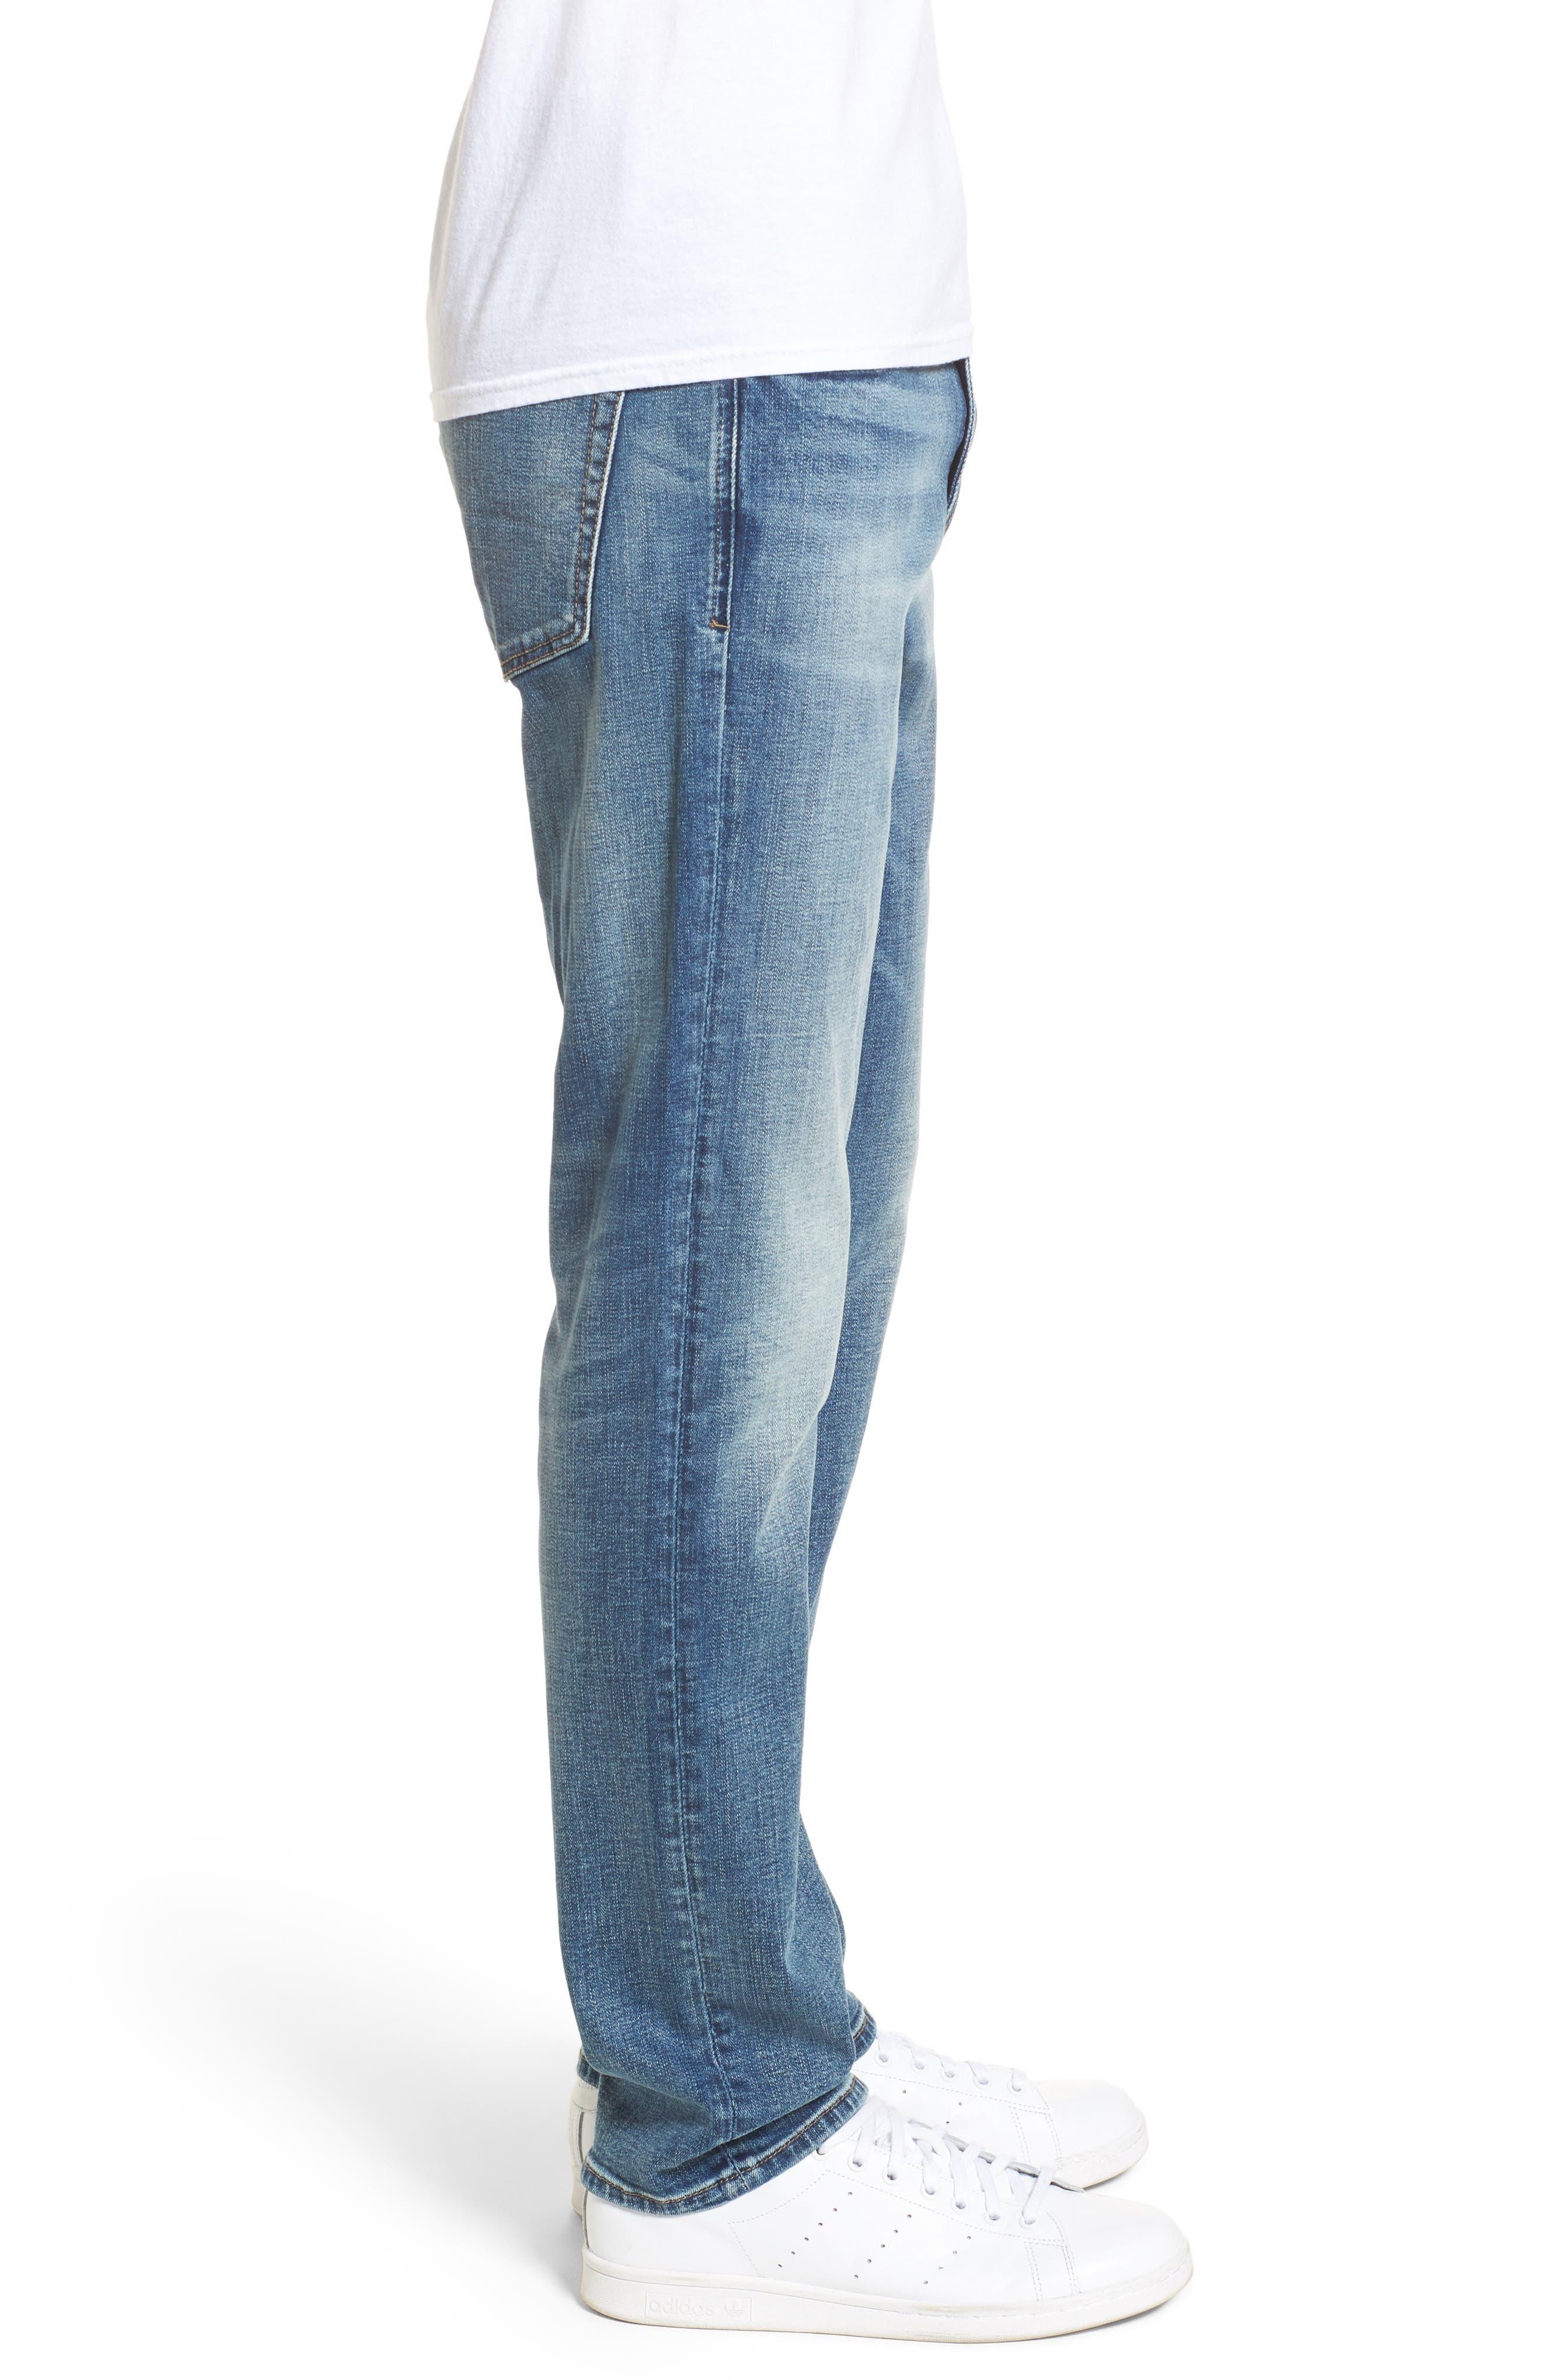 Wooster Slim Fit Jeans,                             Alternate thumbnail 3, color,                             400